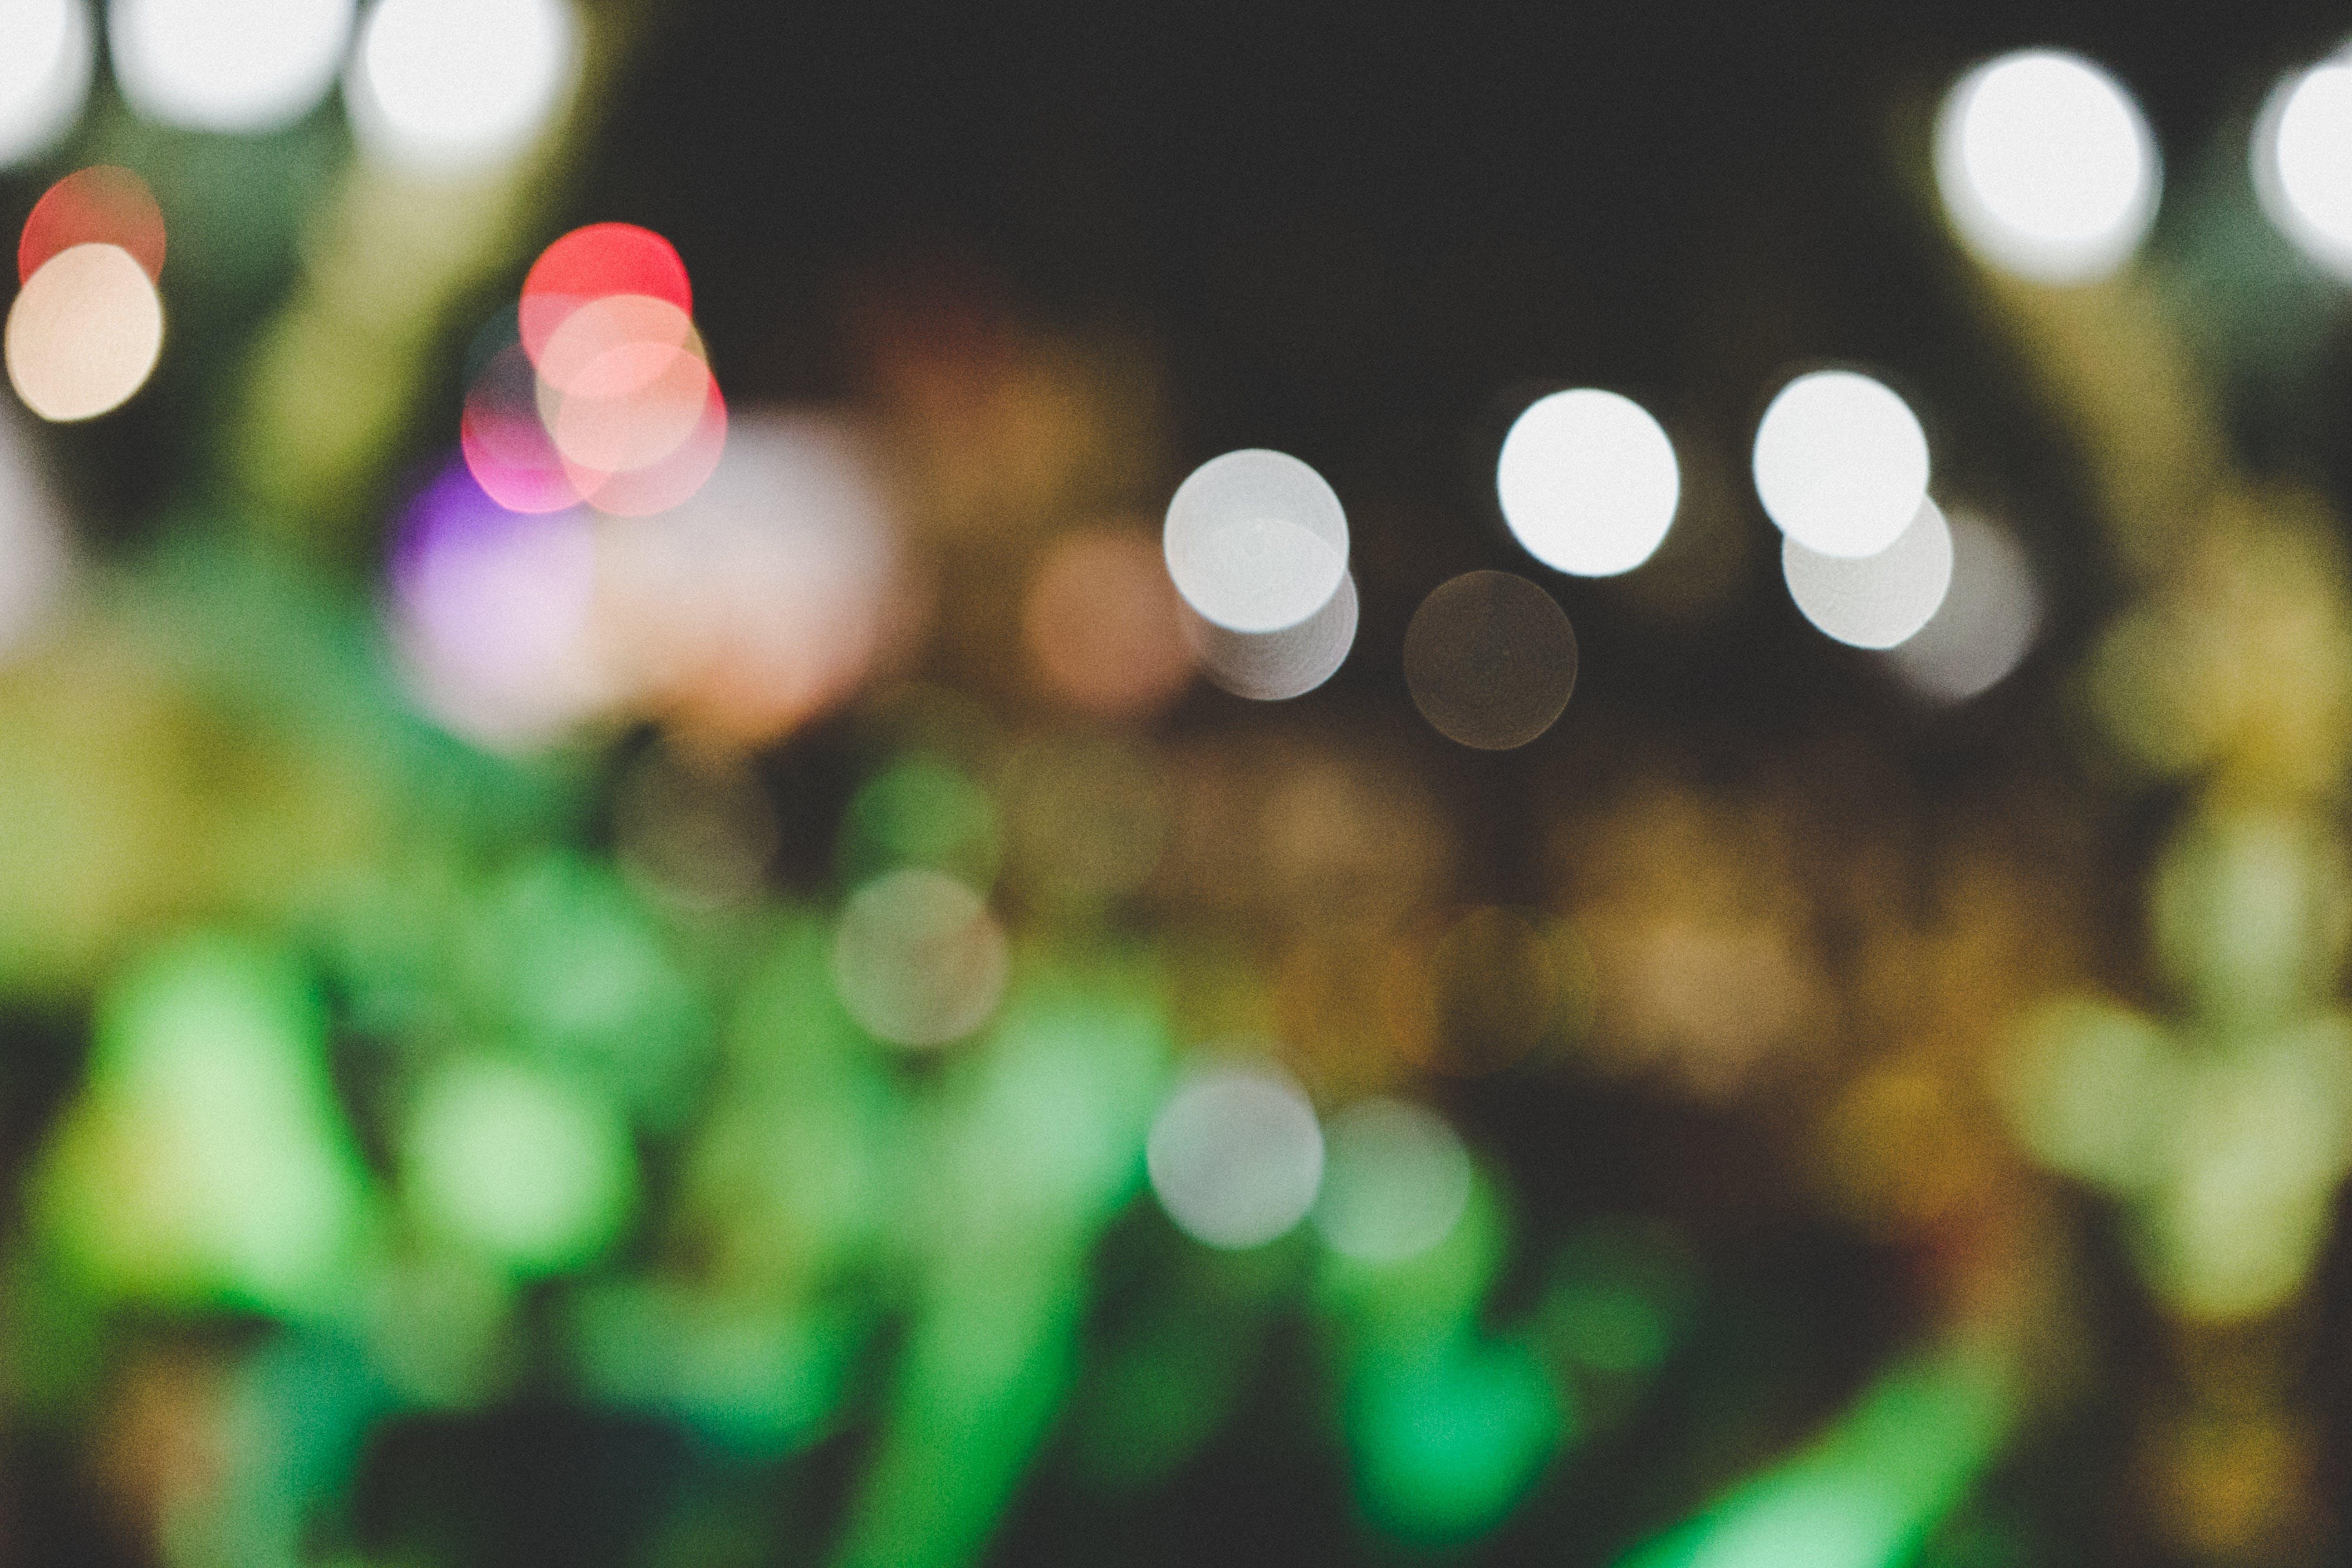 Free stock photo of abstract, beautiful, blur, bokeh